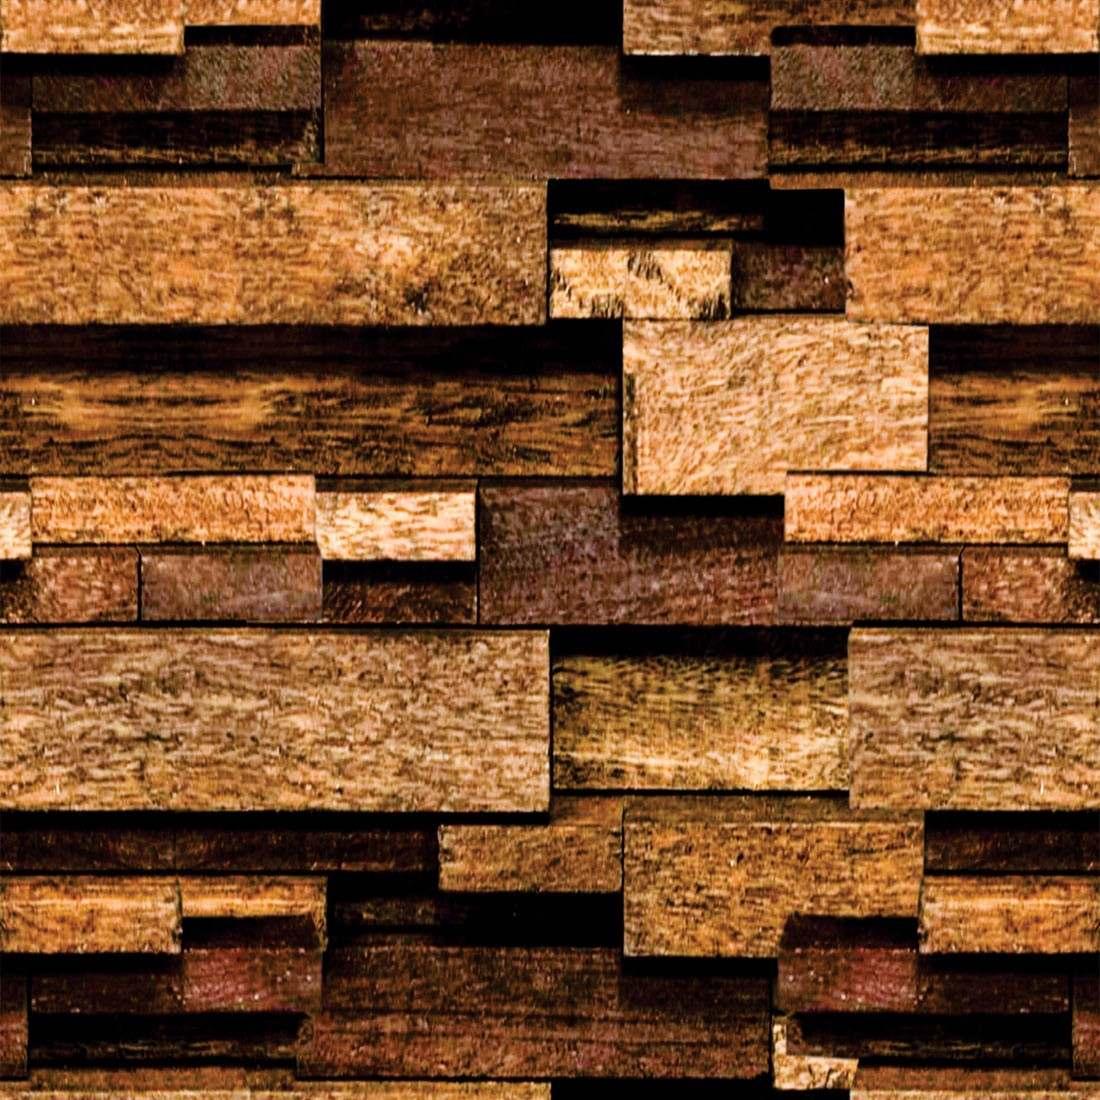 Papel de parede madeira t buas 3d adesivo fosco r 59 94 for Papel de pared rustico